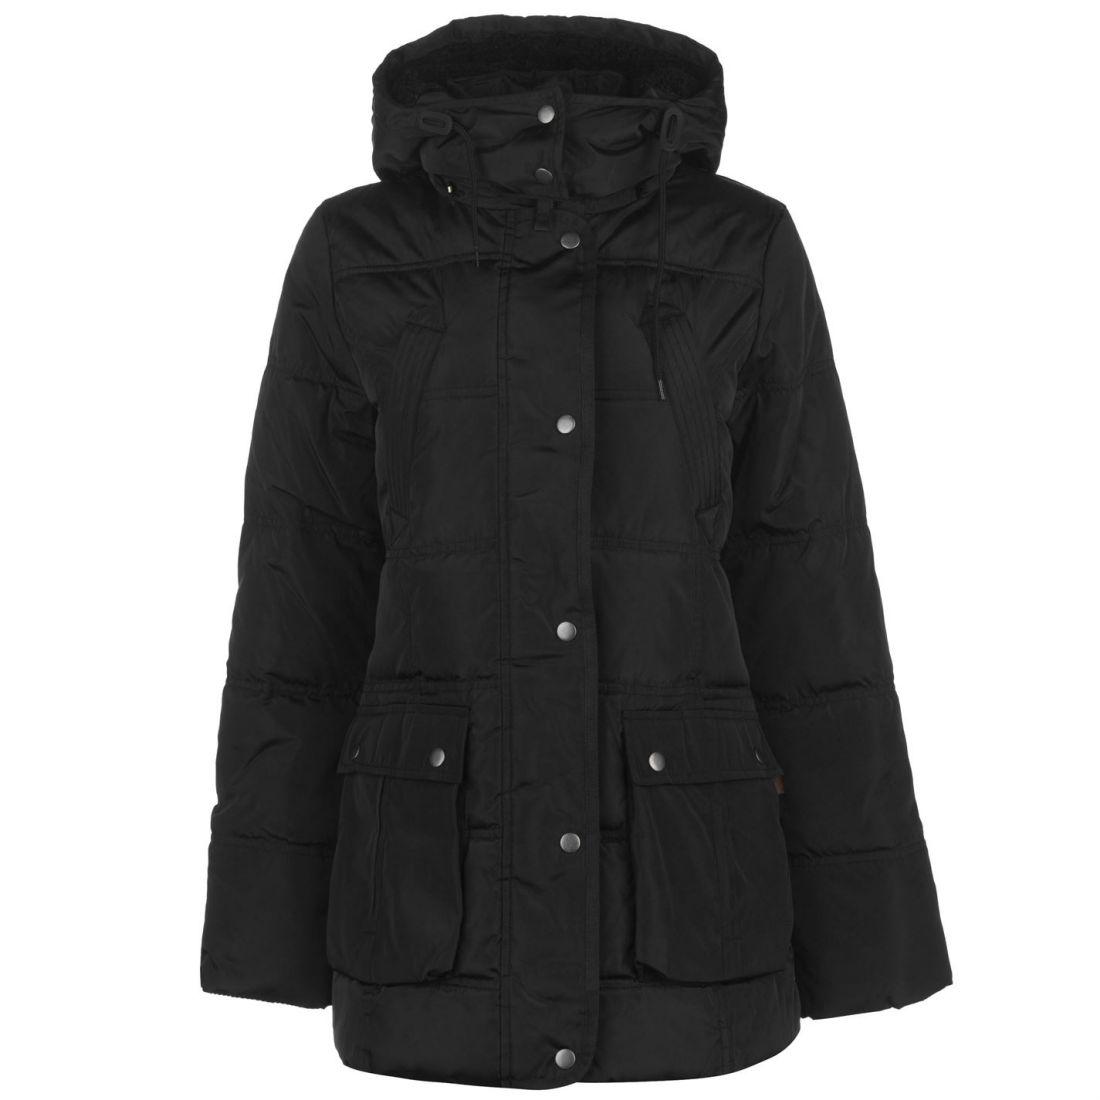 GH Bass Womens Padded Jacket Puffer Coat Top Long Sleeve Cotton Hooded Zip  Full 192835d4829e